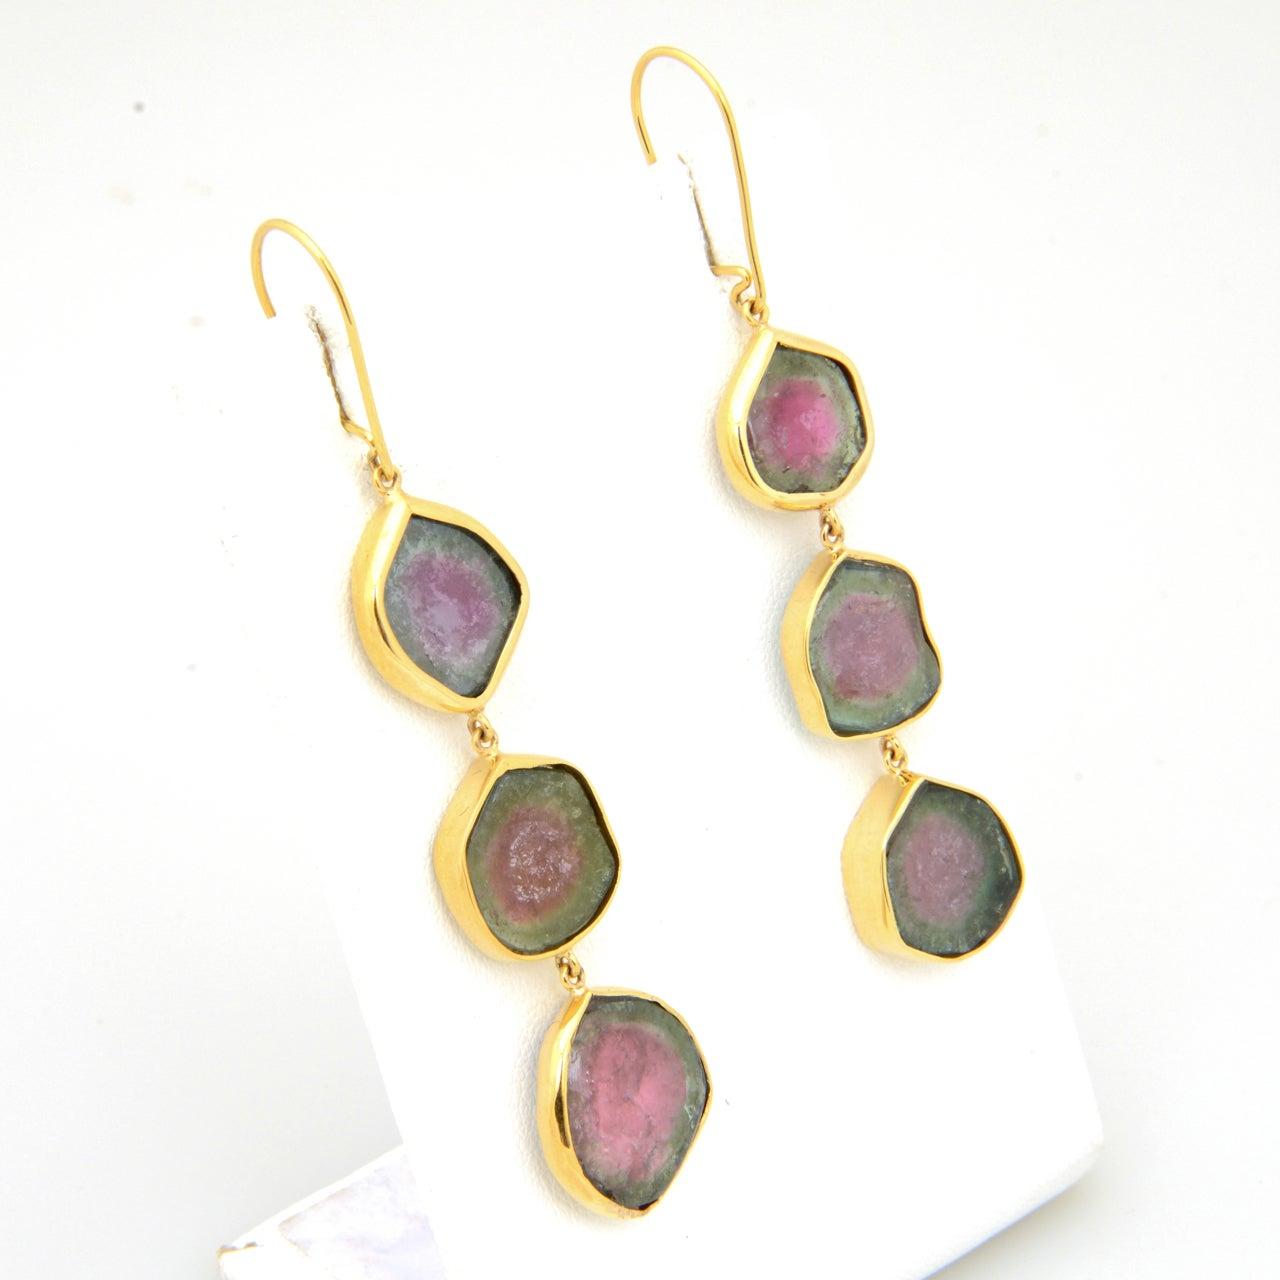 watermelon tourmaline gold earrings at 1stdibs